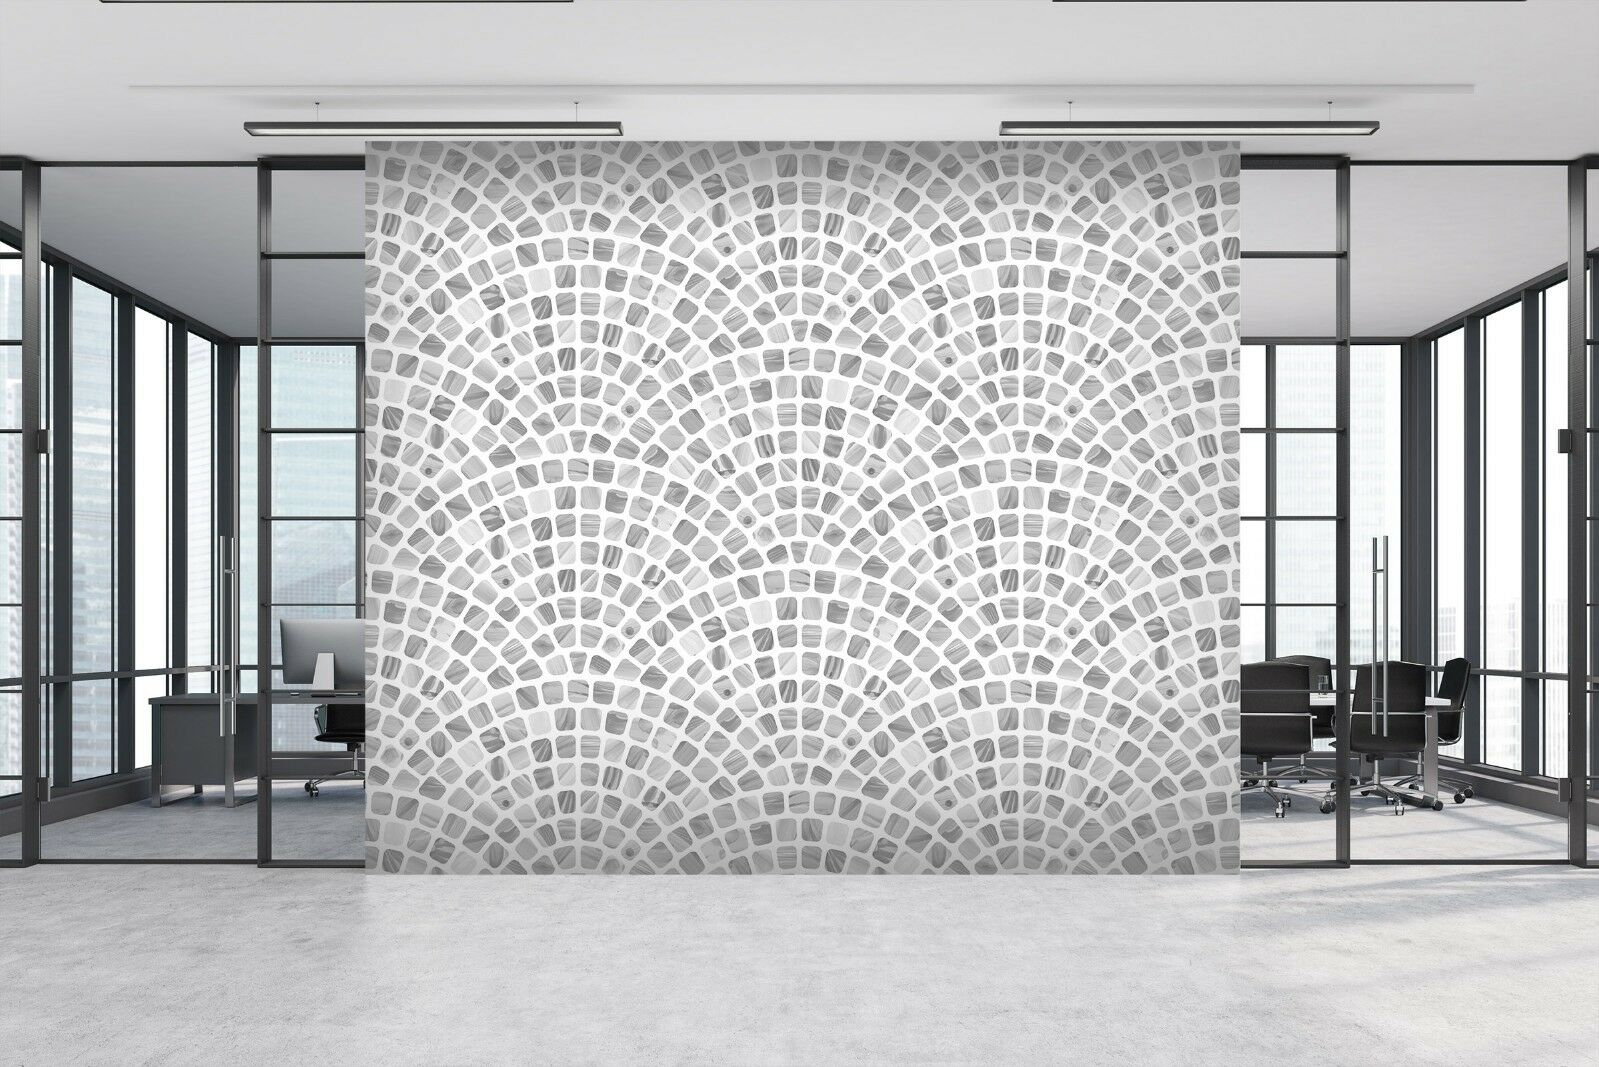 3D Umbrella Piece 7546 Texture Tiles Marble Wall Paper Decal Wallpaper Mural AJ